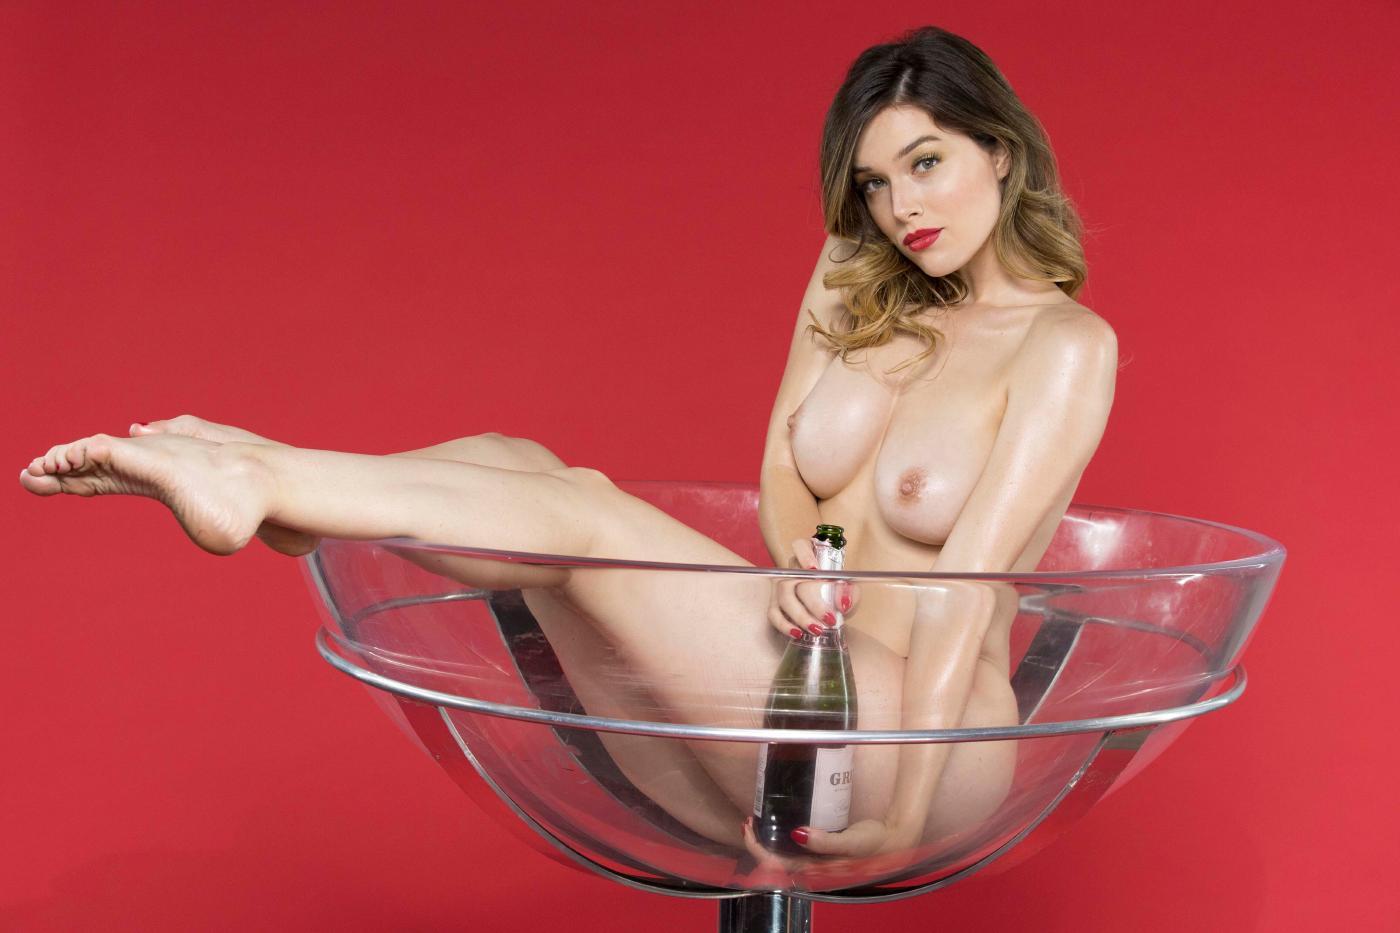 Lauren Summer Nude Playboy Photoshoot Leaked Hhewux